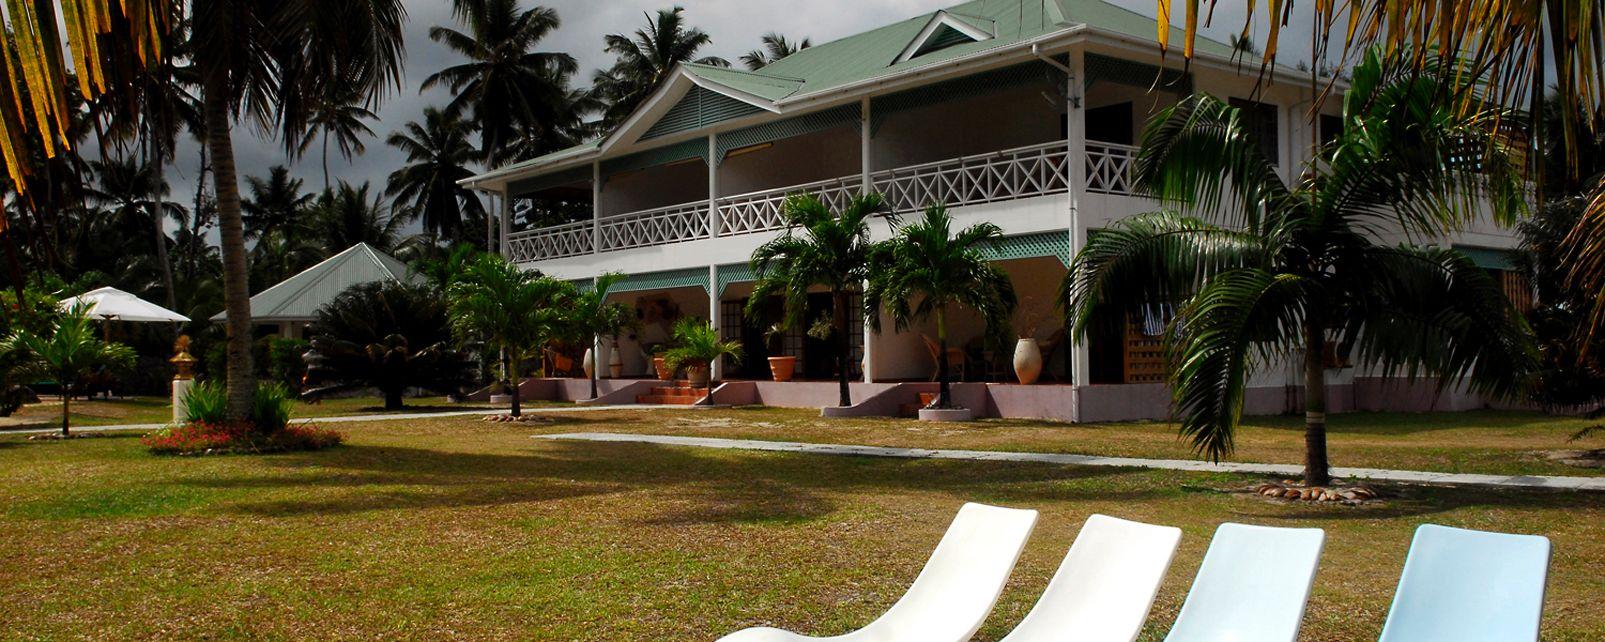 Hôtel L'Habitation Cerf Island